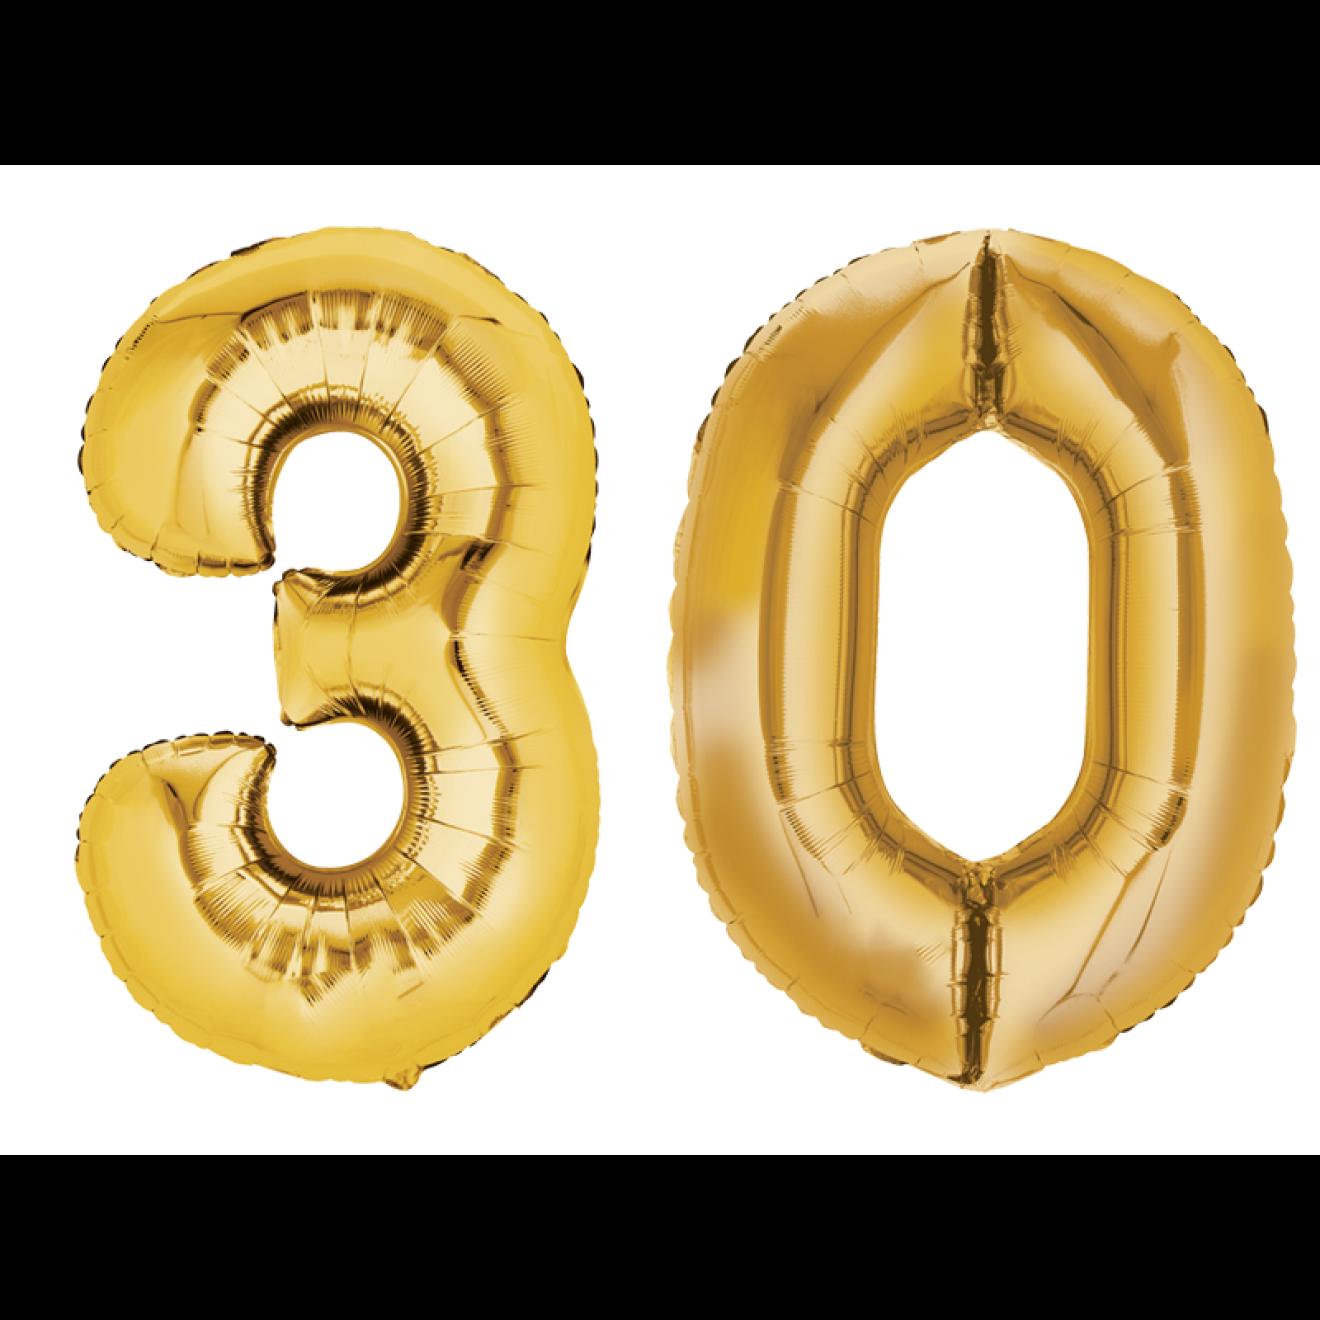 Folienballon set zahl 30 gold 40 cm for Geburtstagsdeko 30